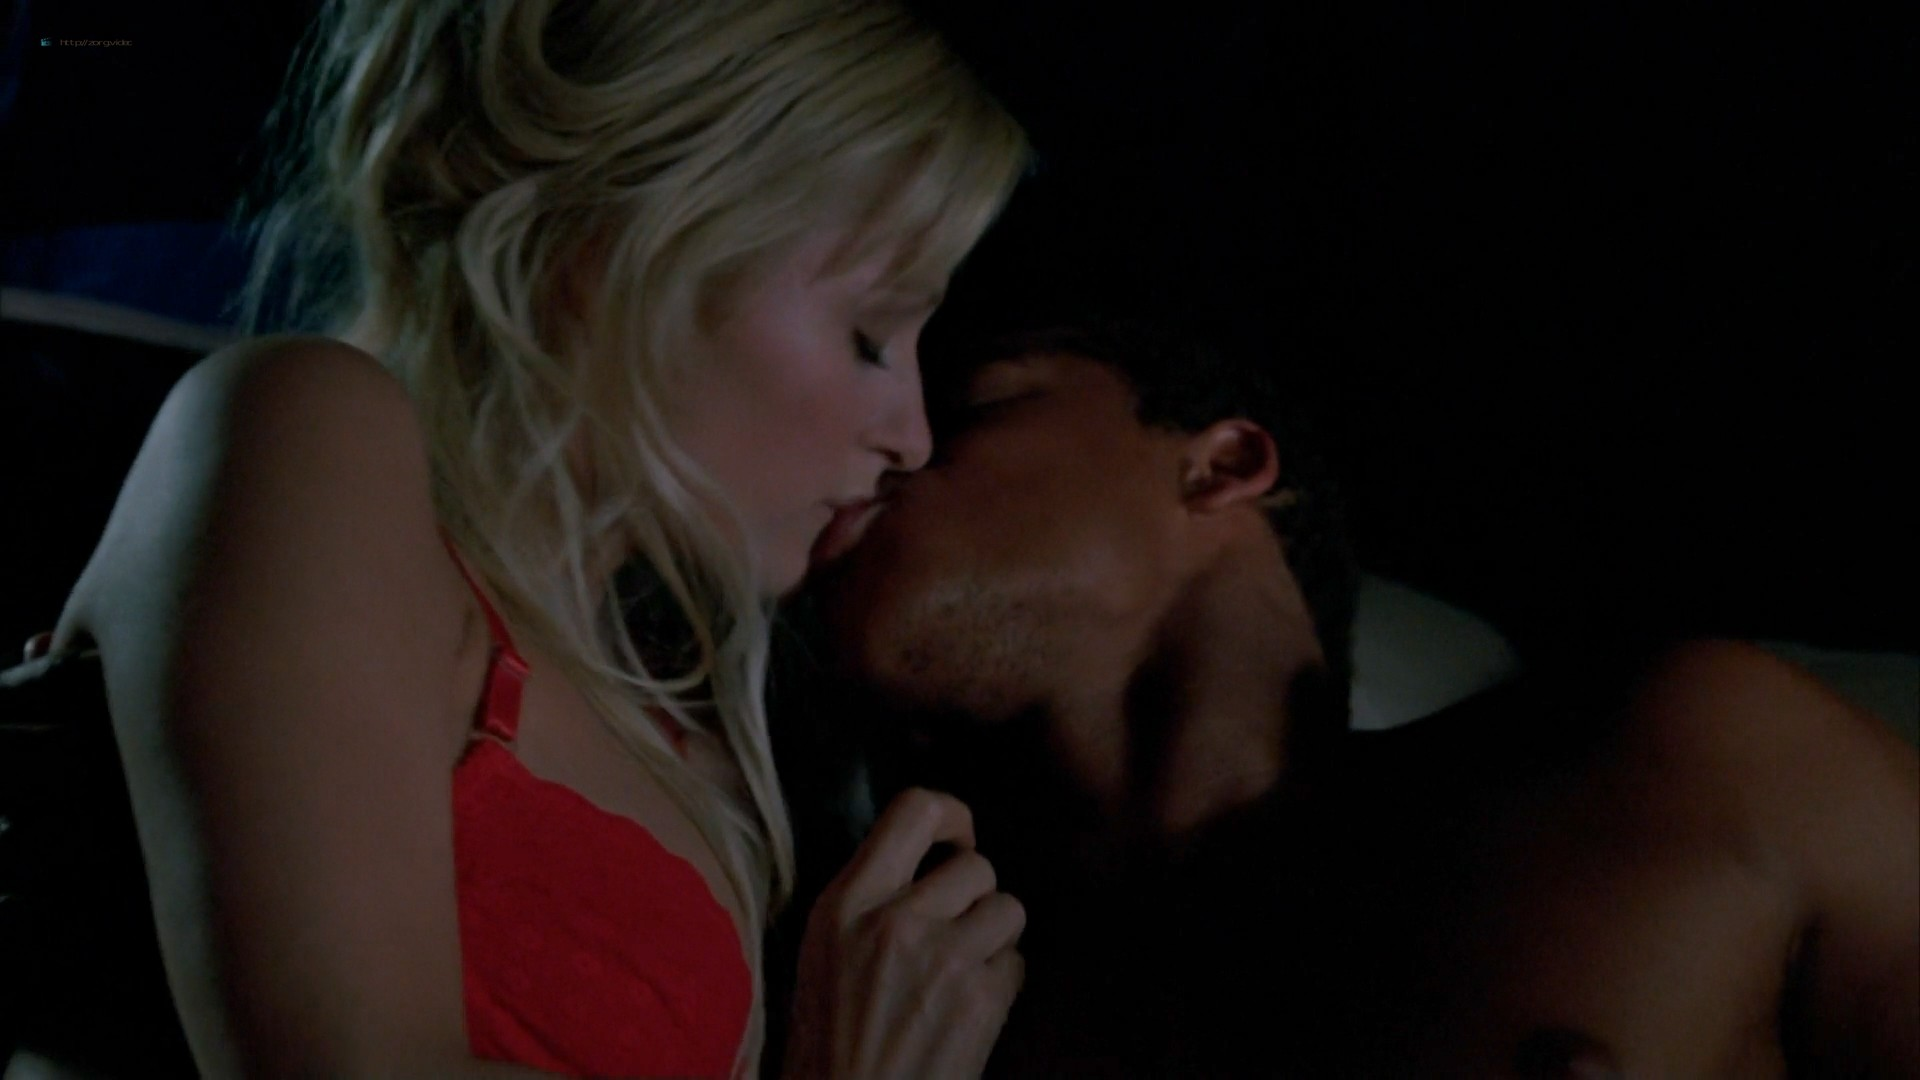 Elisha Cuthbert hot cleavage Paris Hilton striping to bra and panties - House of Wax (2005) HD 1080p (3)